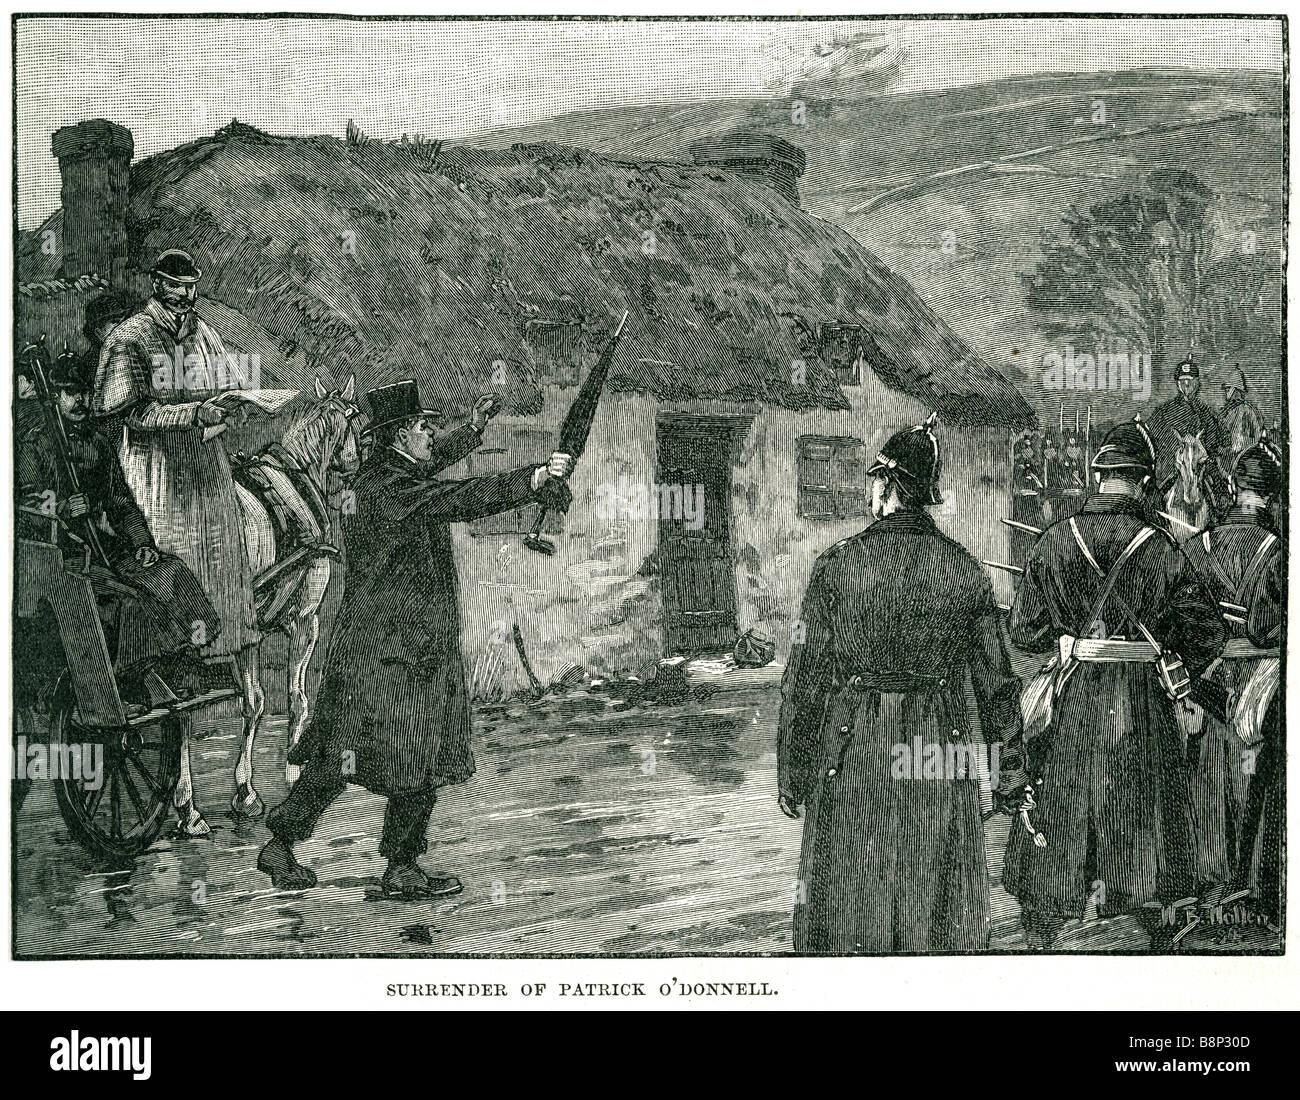 surrender patrick o'donnell 1835 1883 Pádraig Mhícheál Airt Ó Domhnaill London - Stock Image